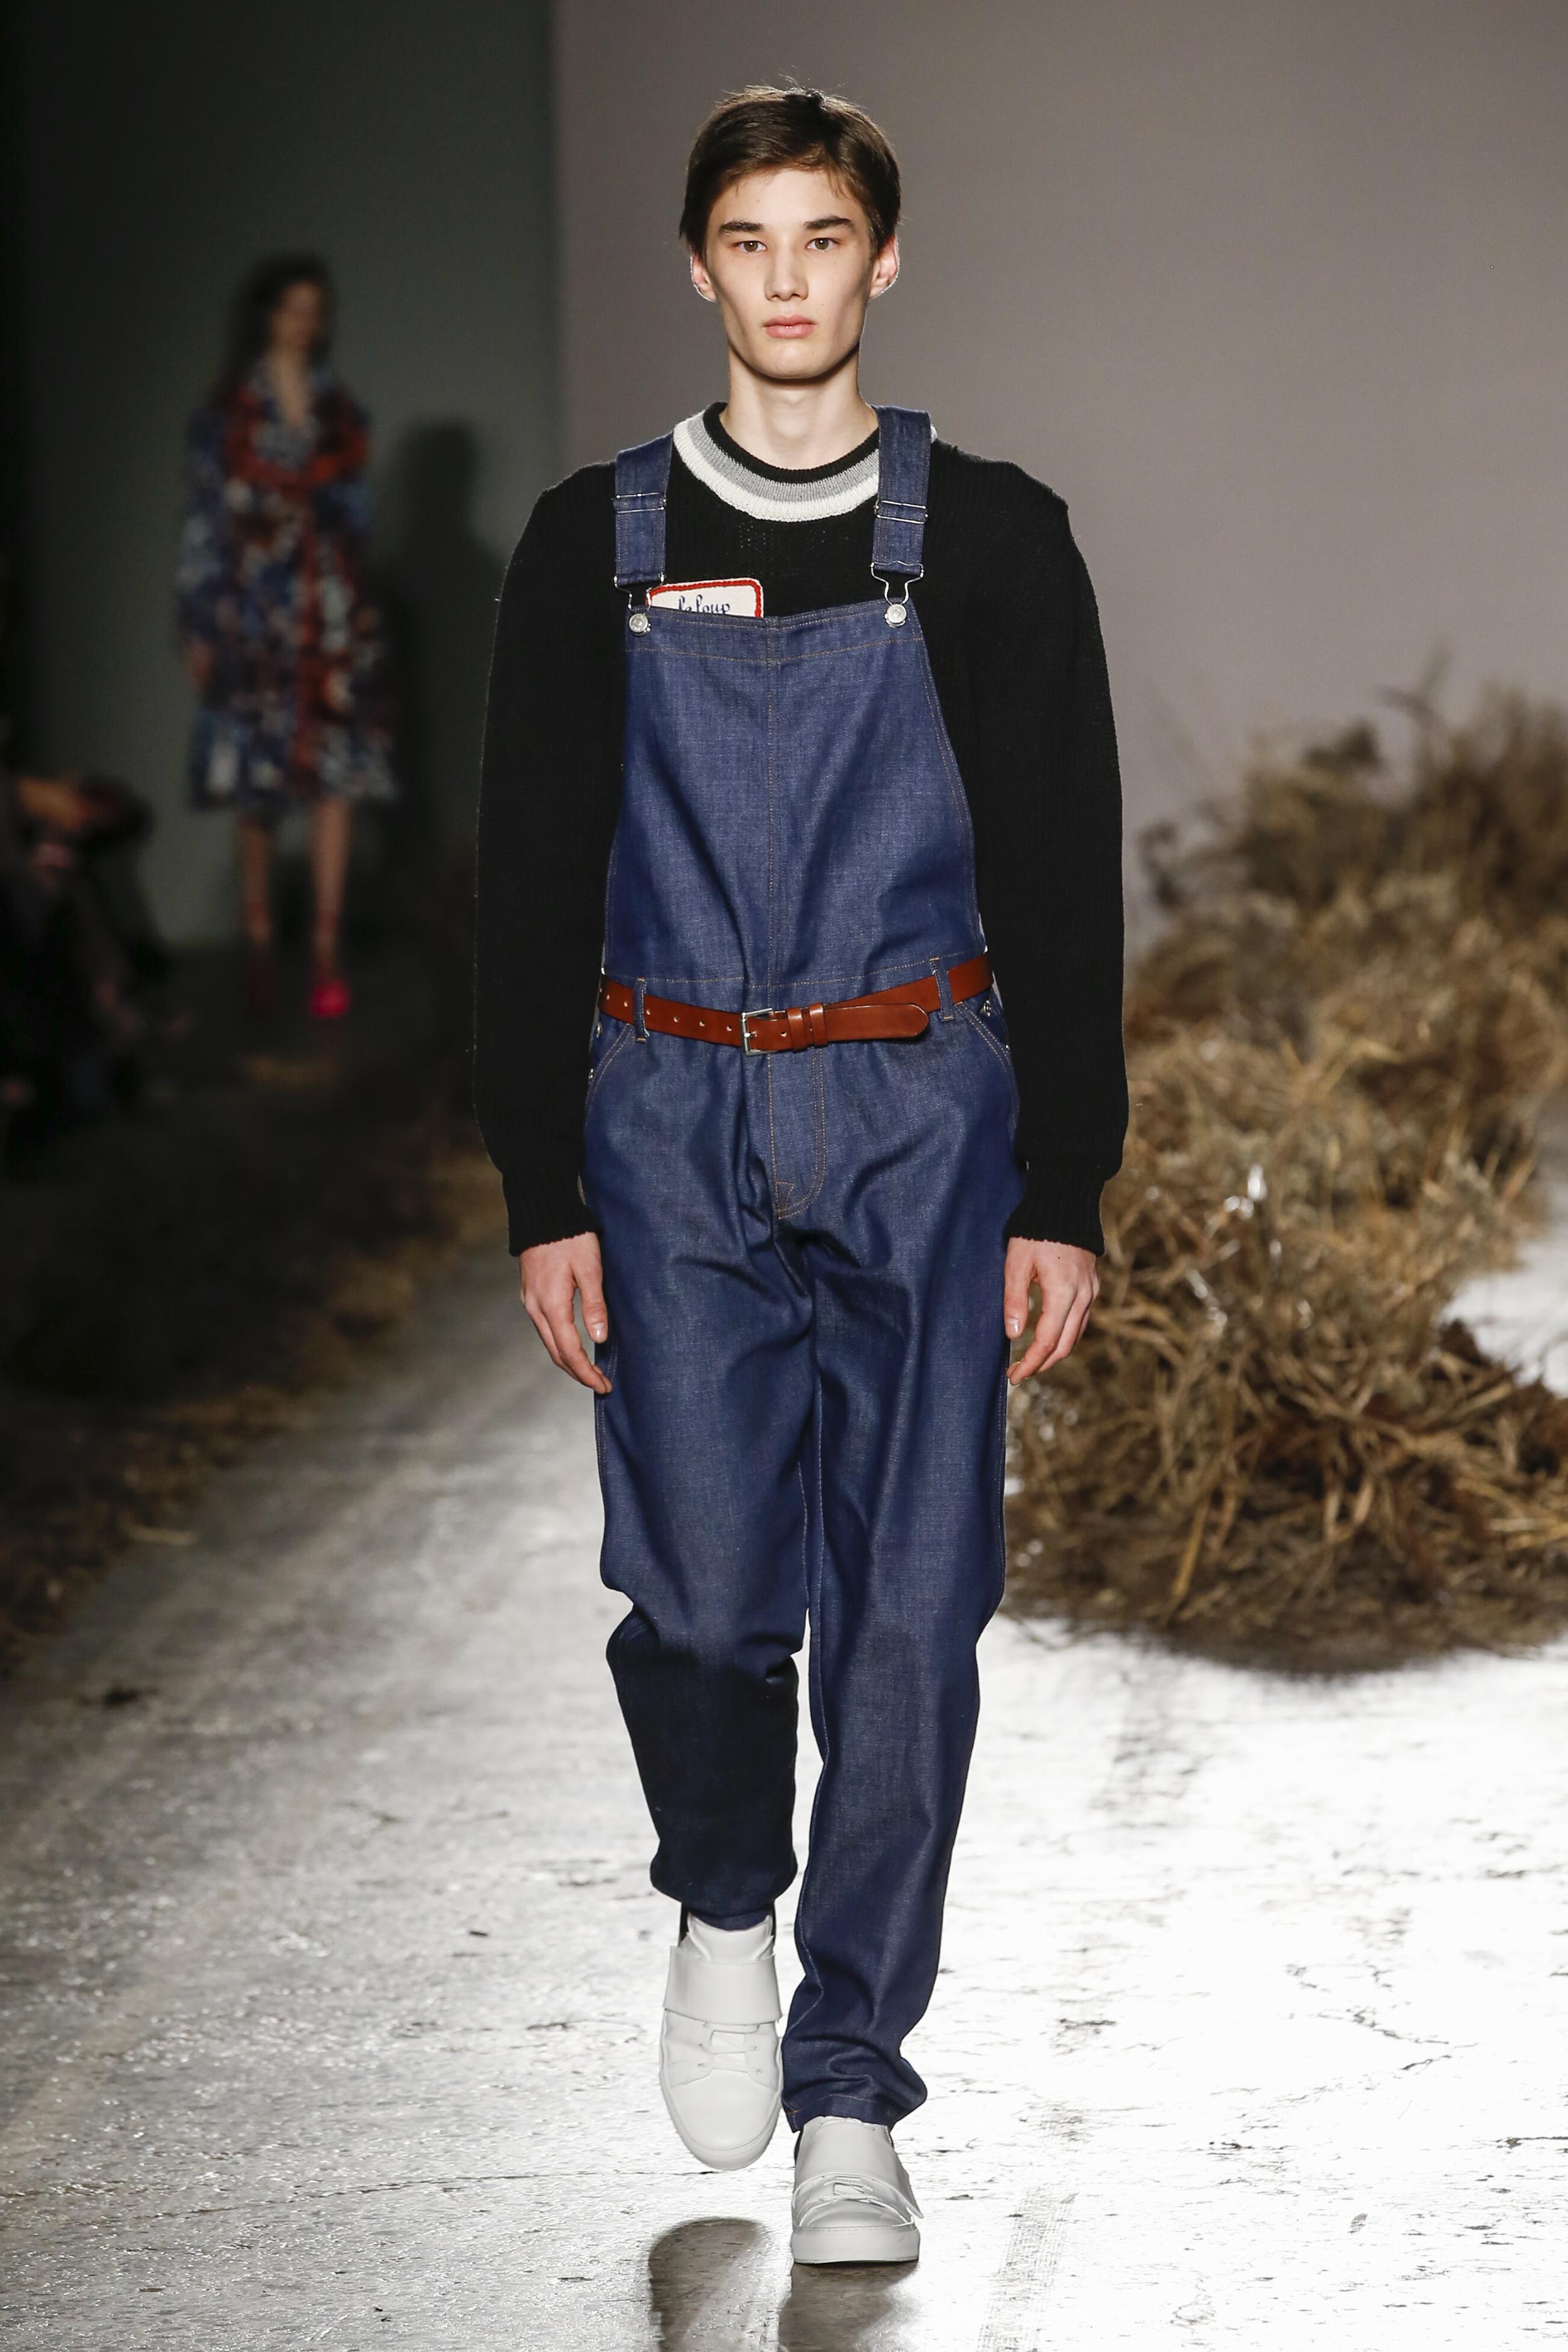 Milan Fashion Week Fall: Latzhose aus Jeansstoff bei Au Jour Le Jour (ddp images)